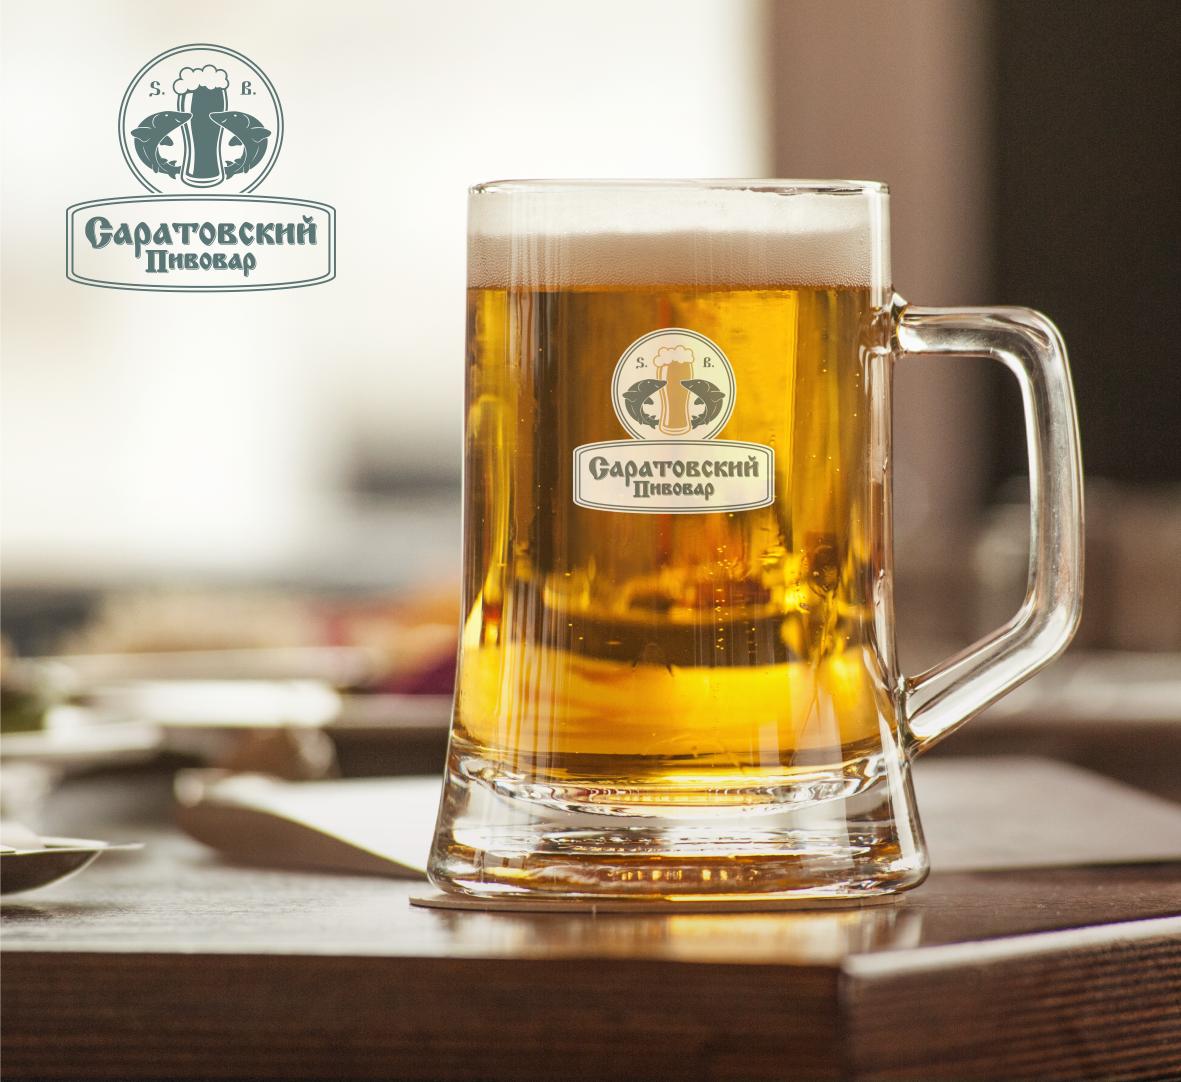 Разработка логотипа для частной пивоварни фото f_9115d80cab27510d.png